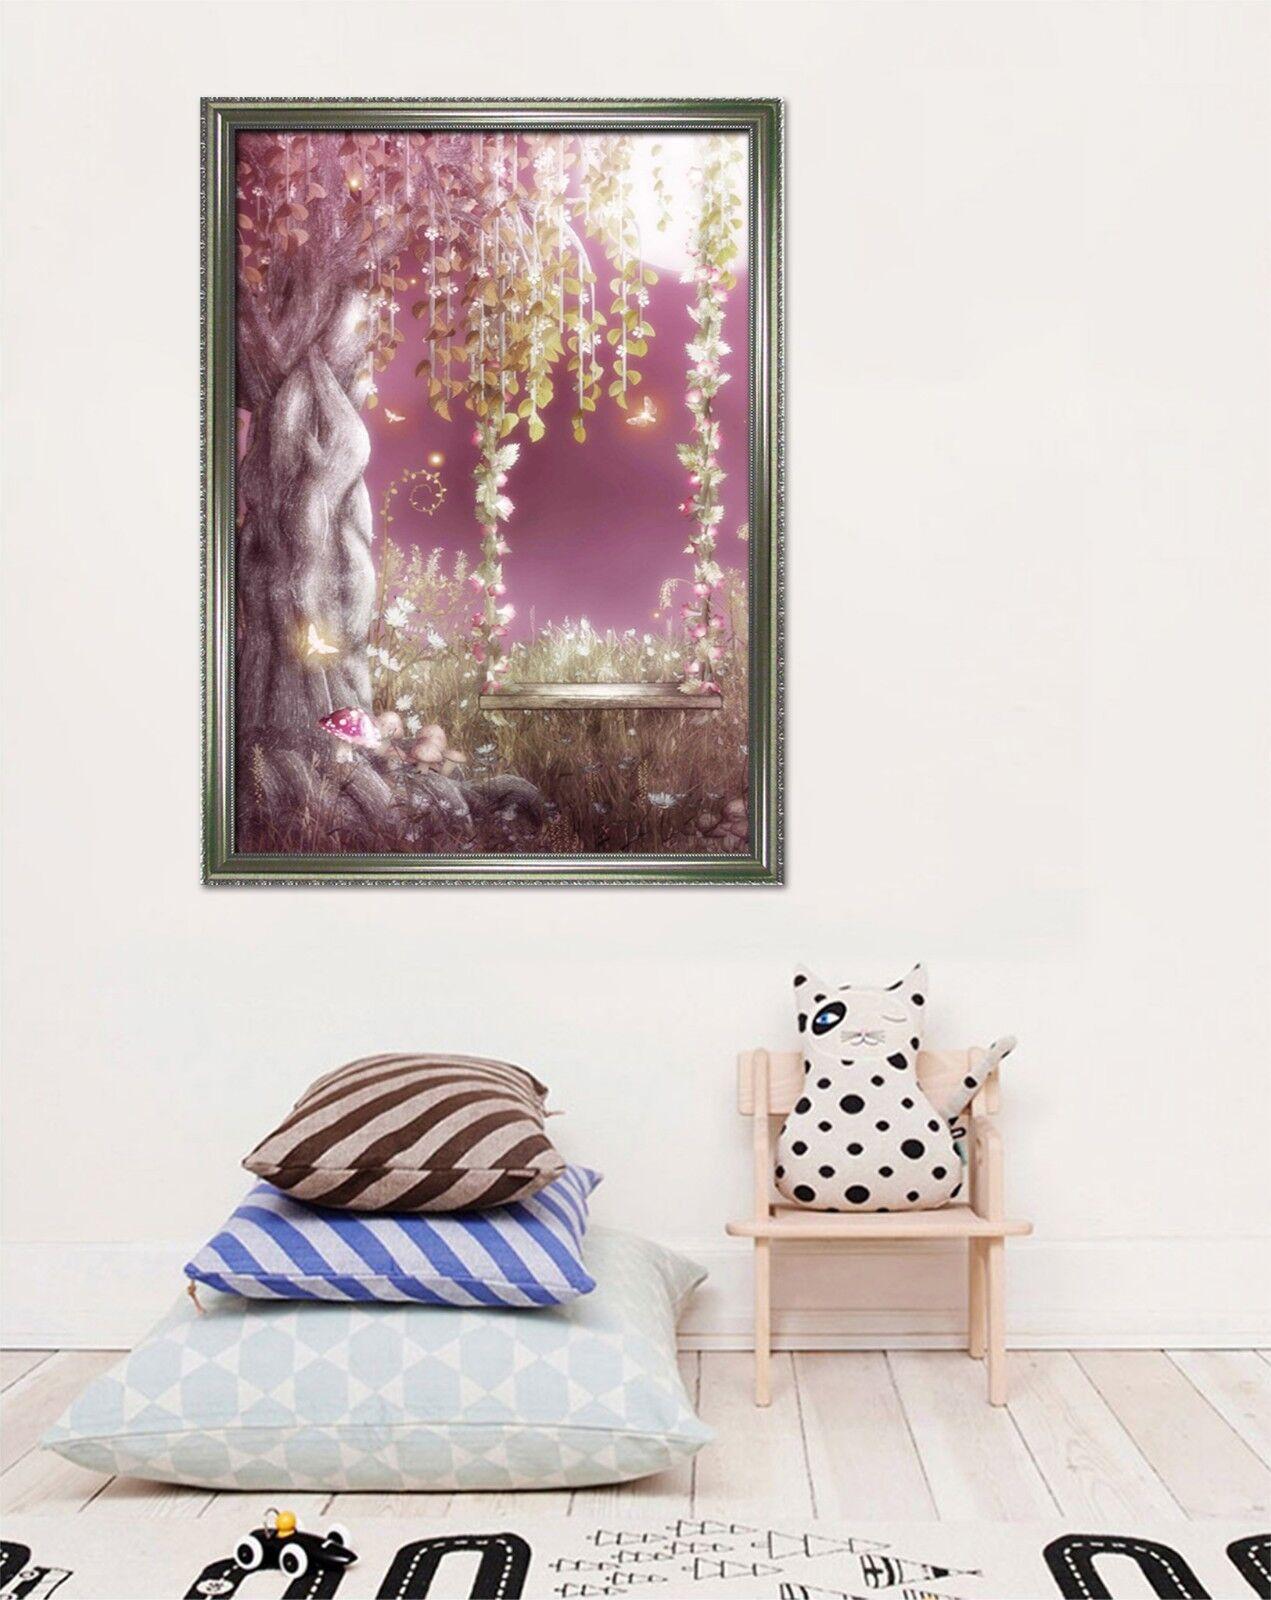 3D Moonlight Grove 665 Fake Framed Poster Home Decor Print Painting Unique Art